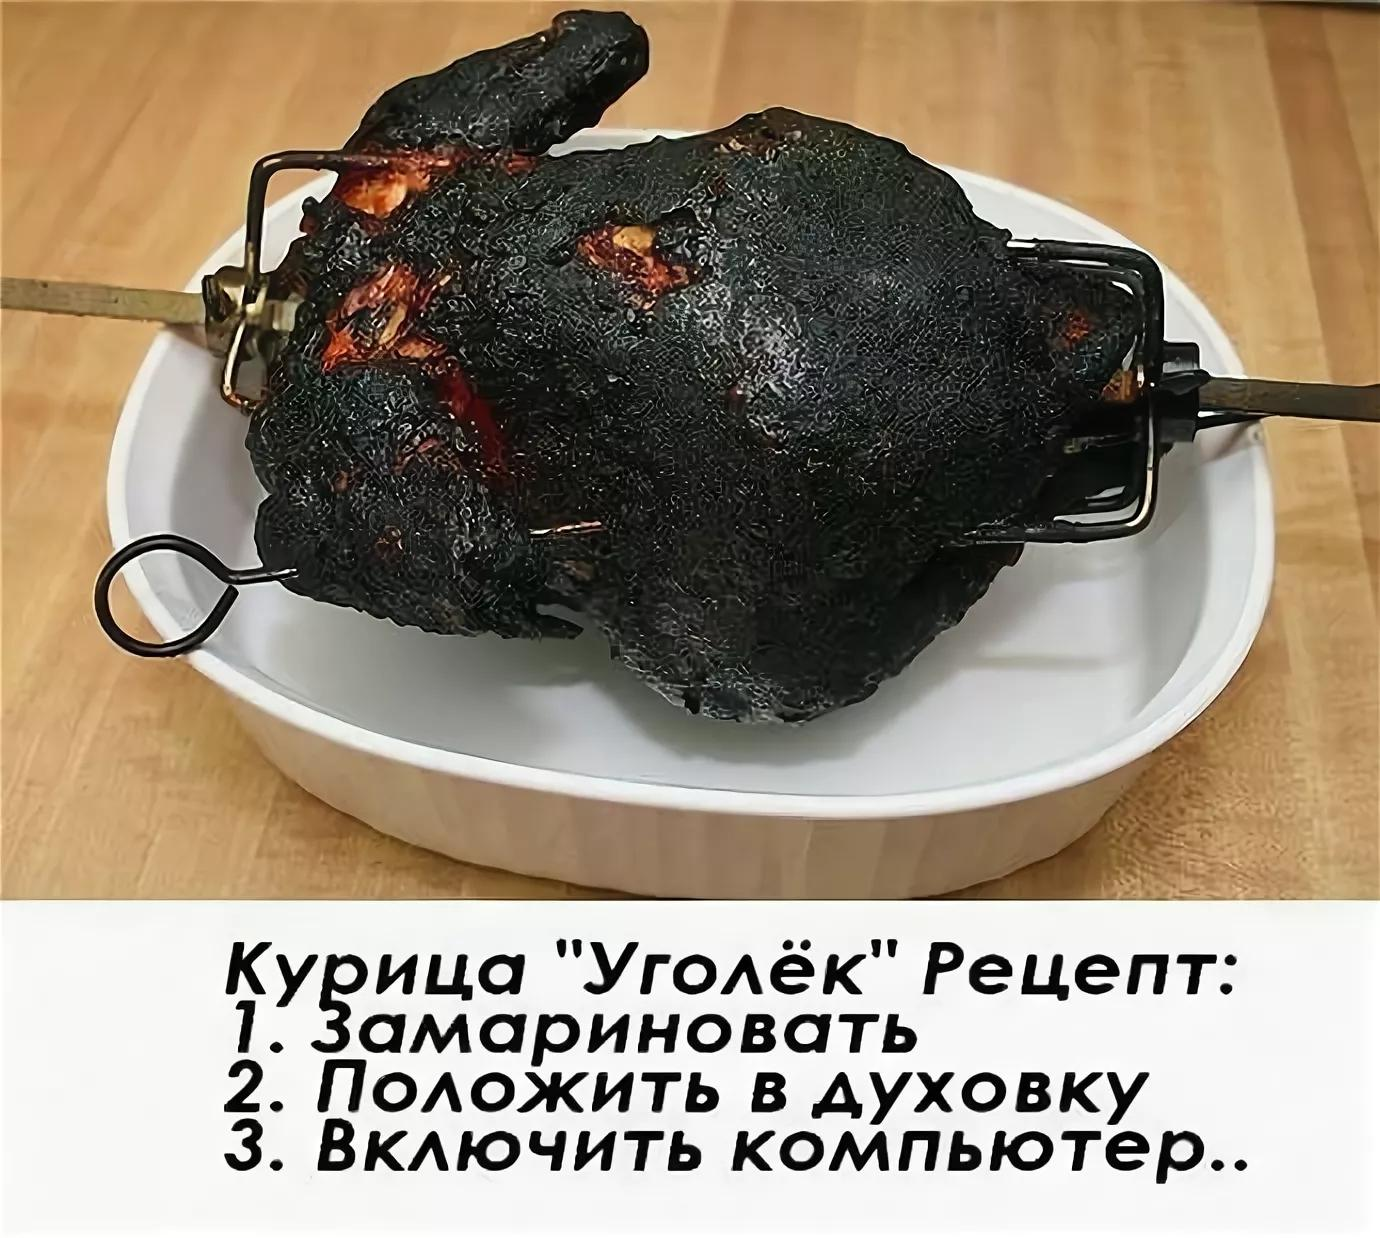 юмор про рецепты картинки быков